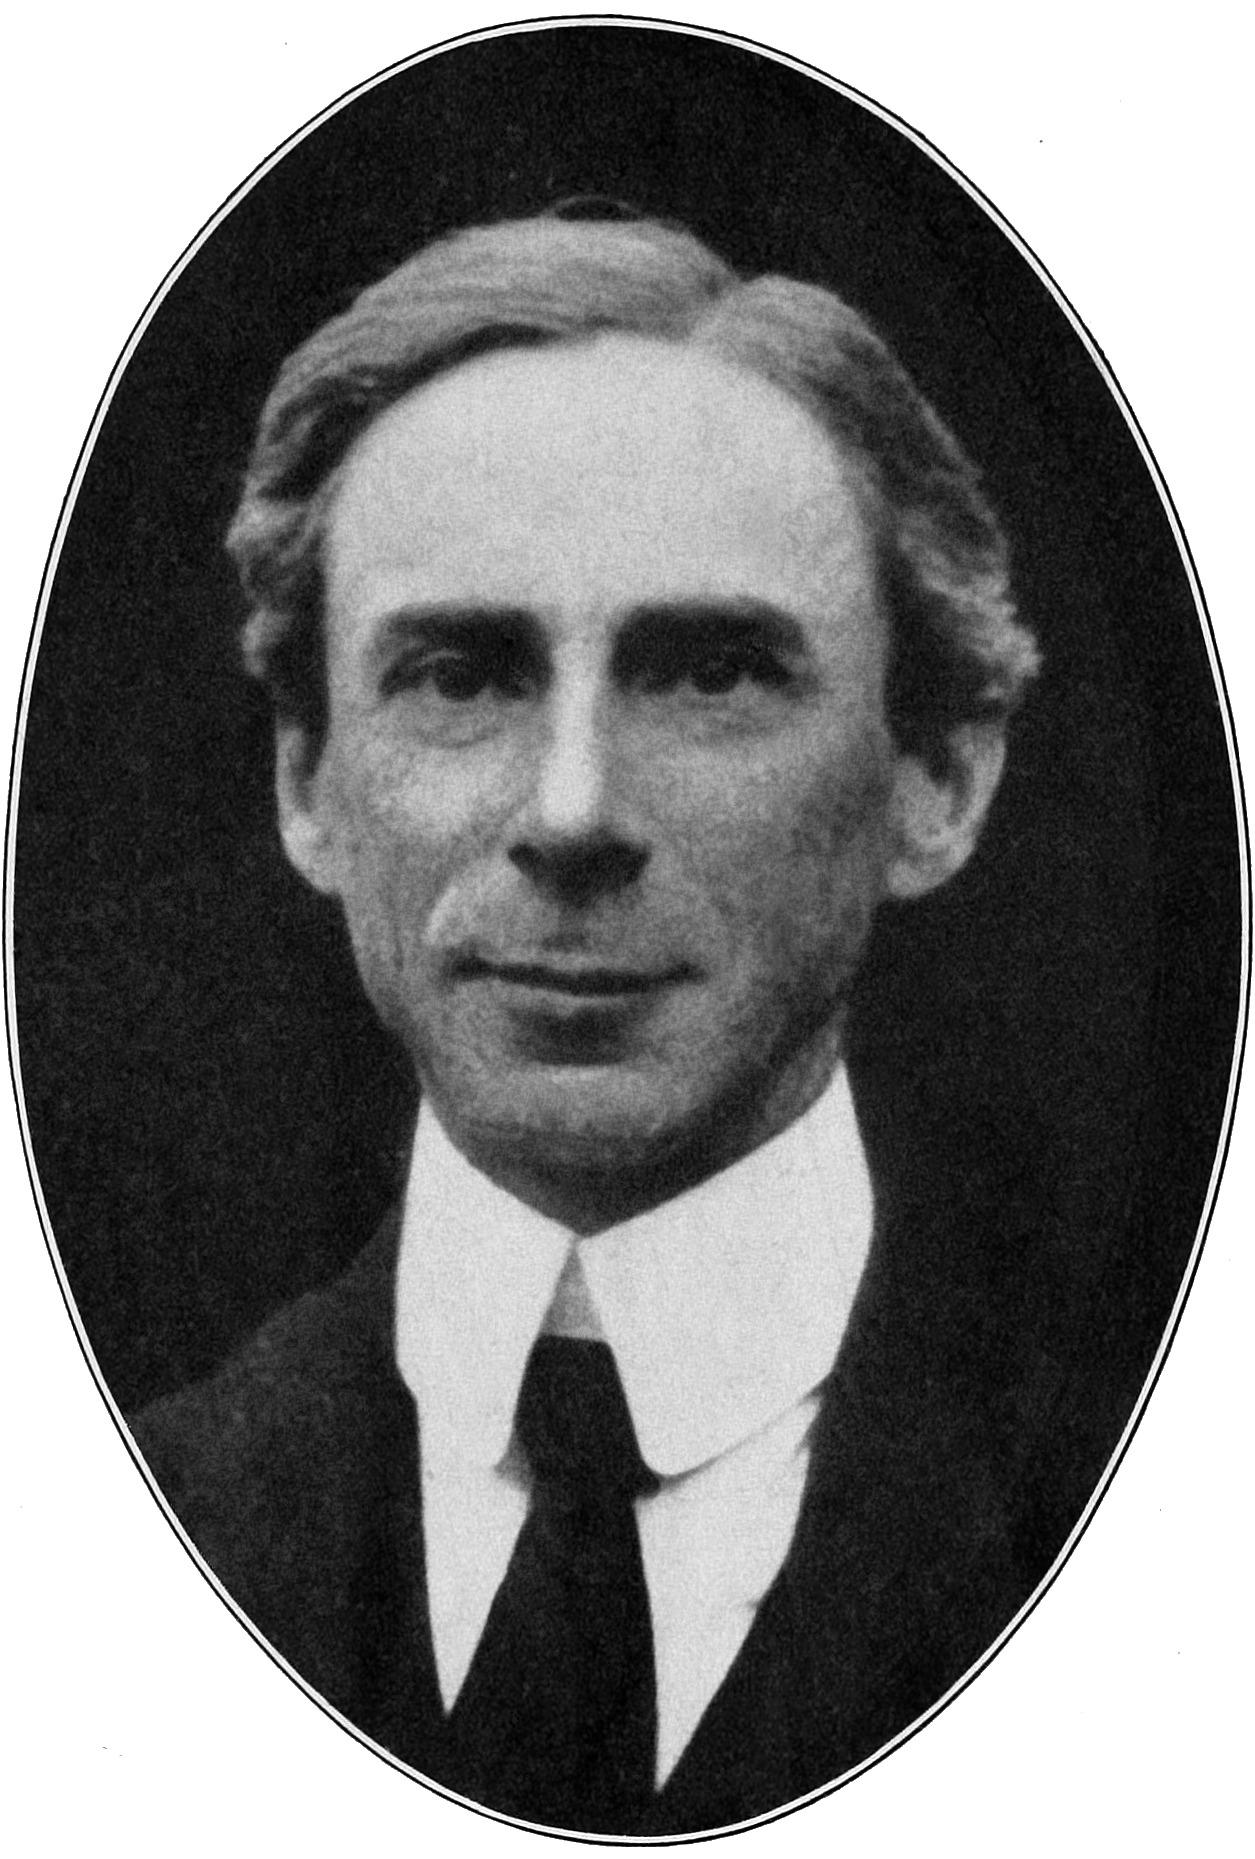 Bertrand Russell portrait